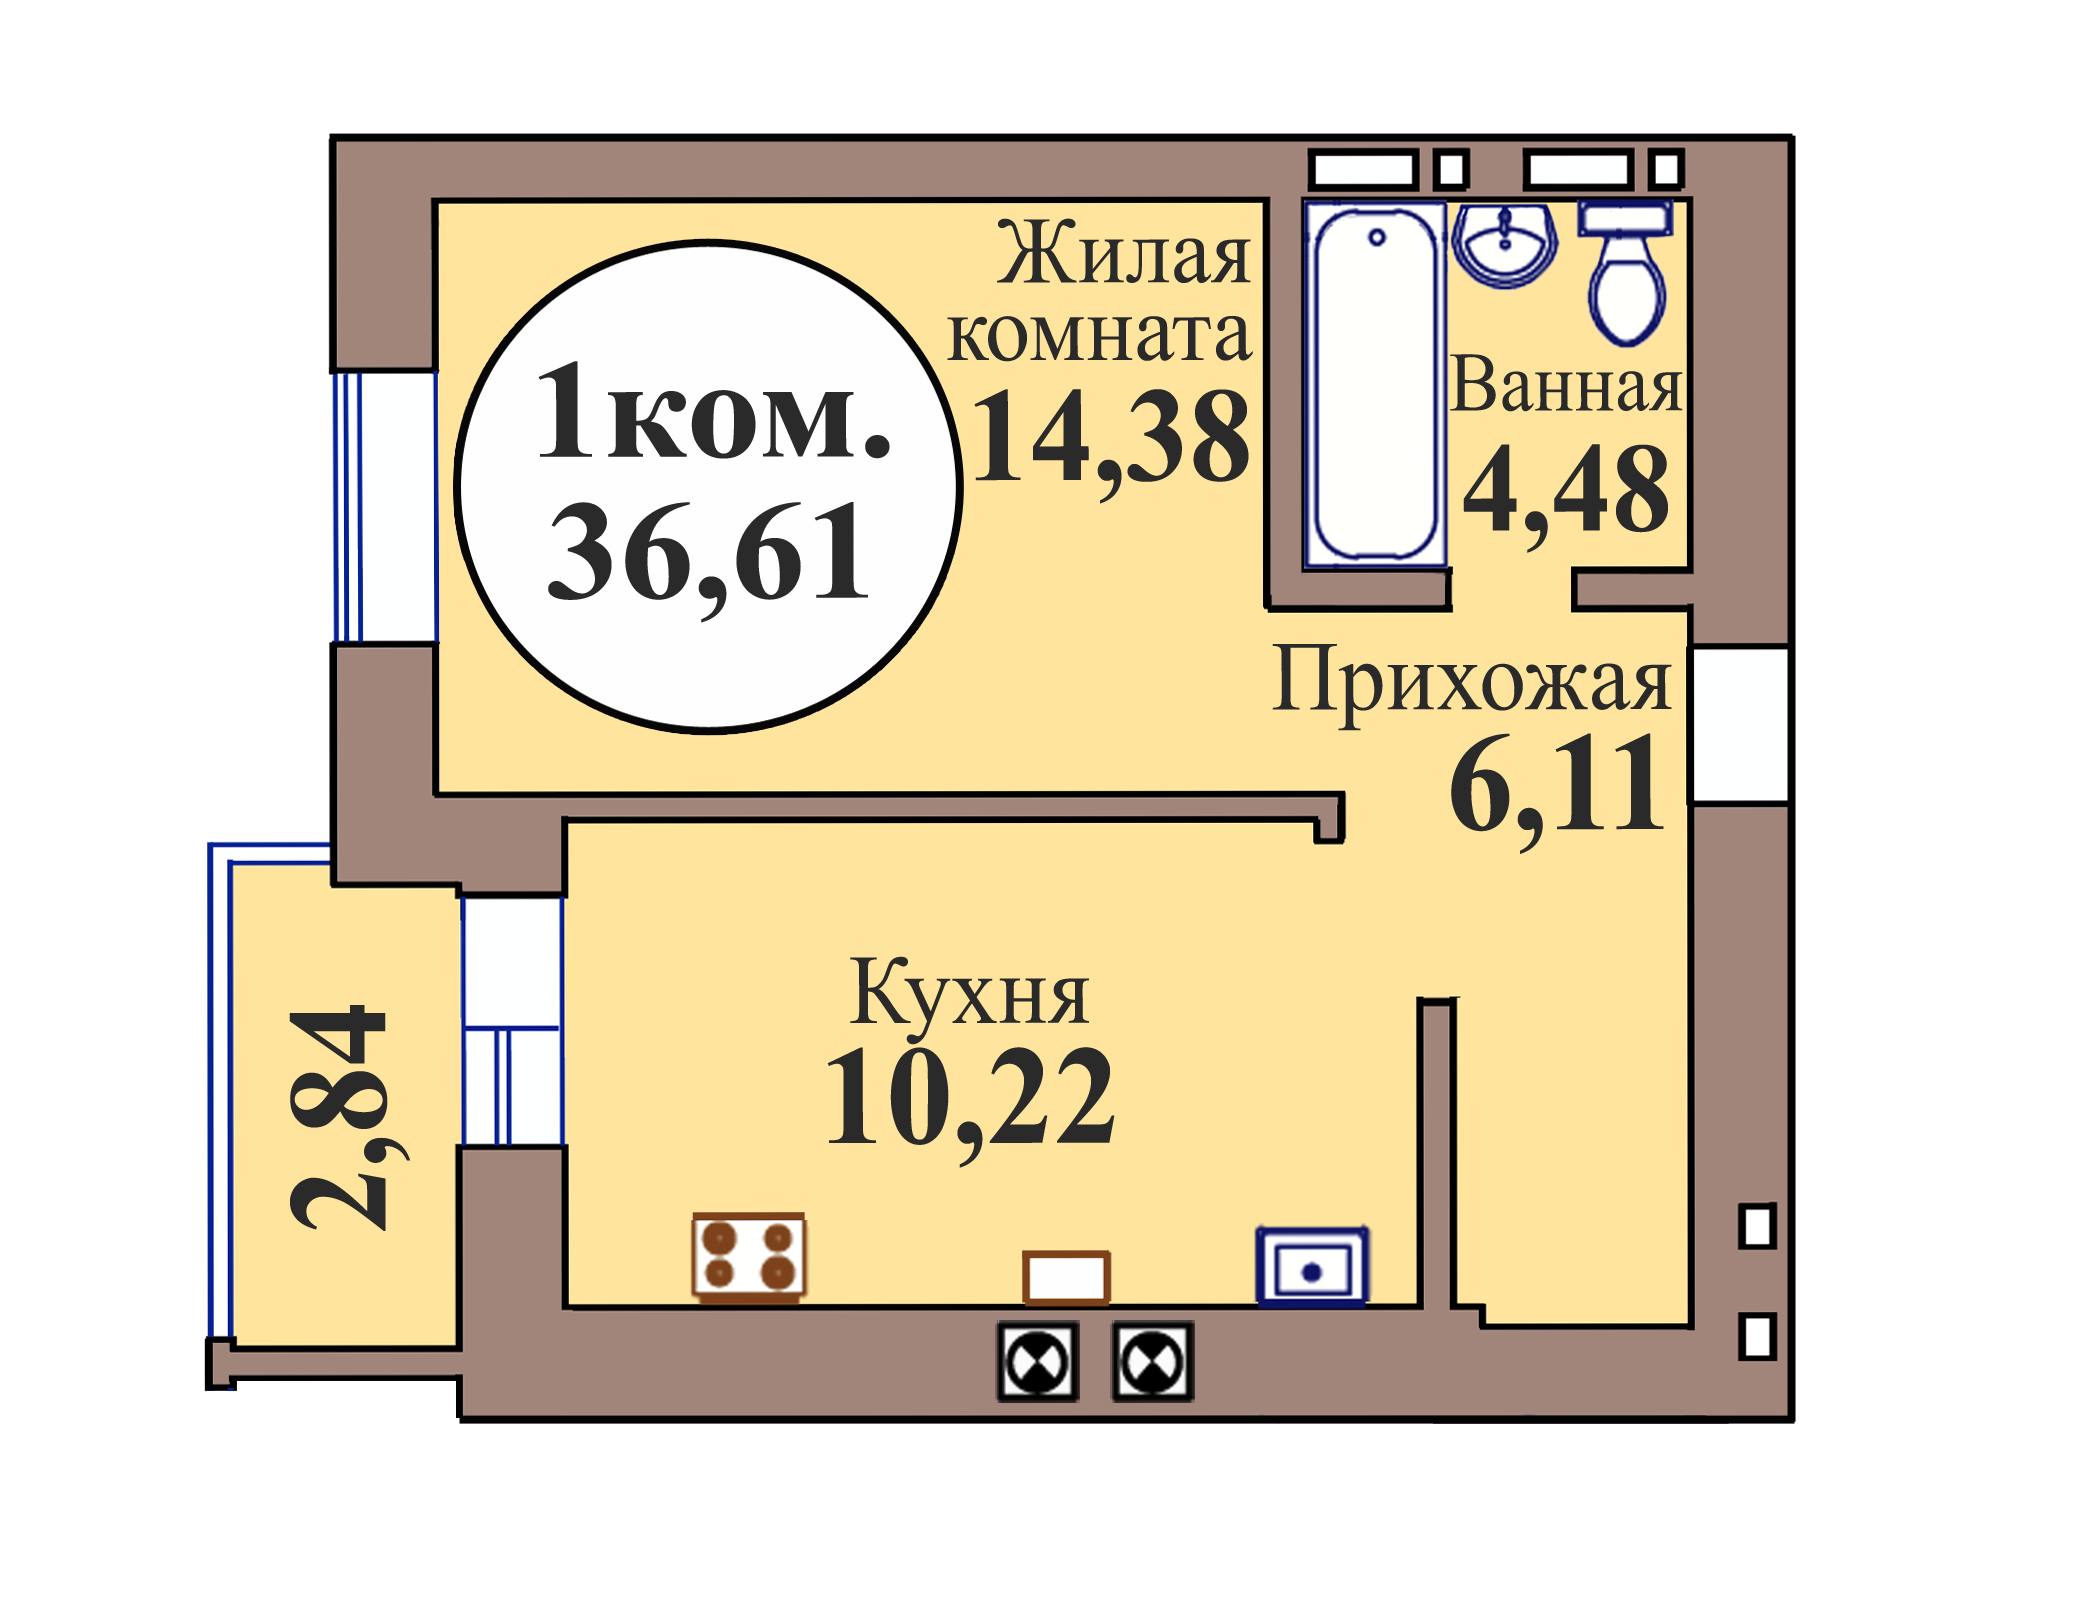 1-комн. кв. по пер. Калининградский, 5 кв. 184 в Калининграде